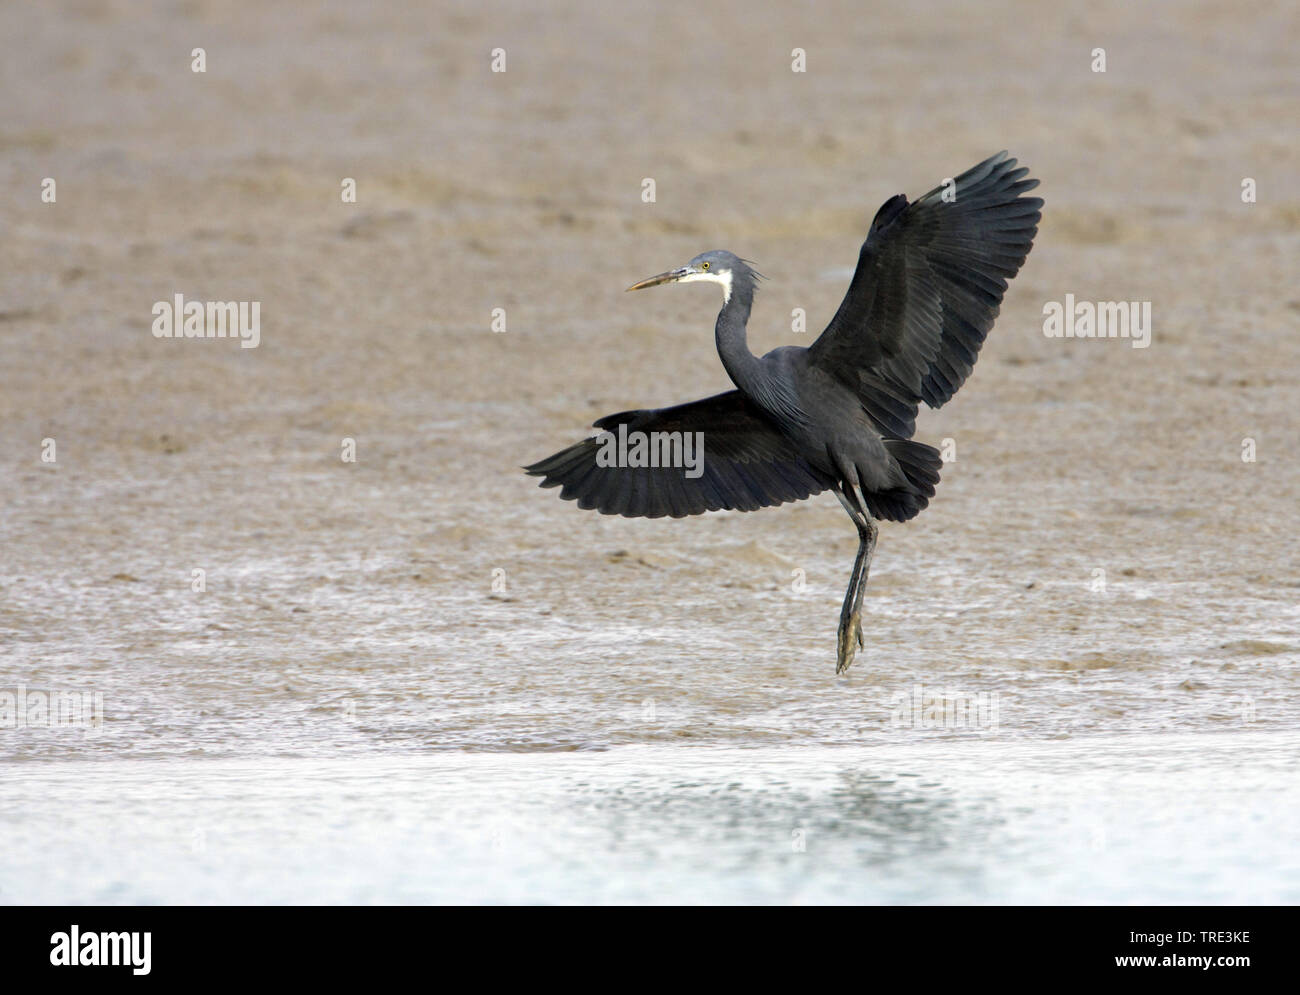 Kuestenreiher, Kuesten-Reiher (Egretta gularis), im Flug, dunkle Morphe, Iran | western reef egret (Egretta gularis), in flight, dark morph, Iran | BL - Stock Image